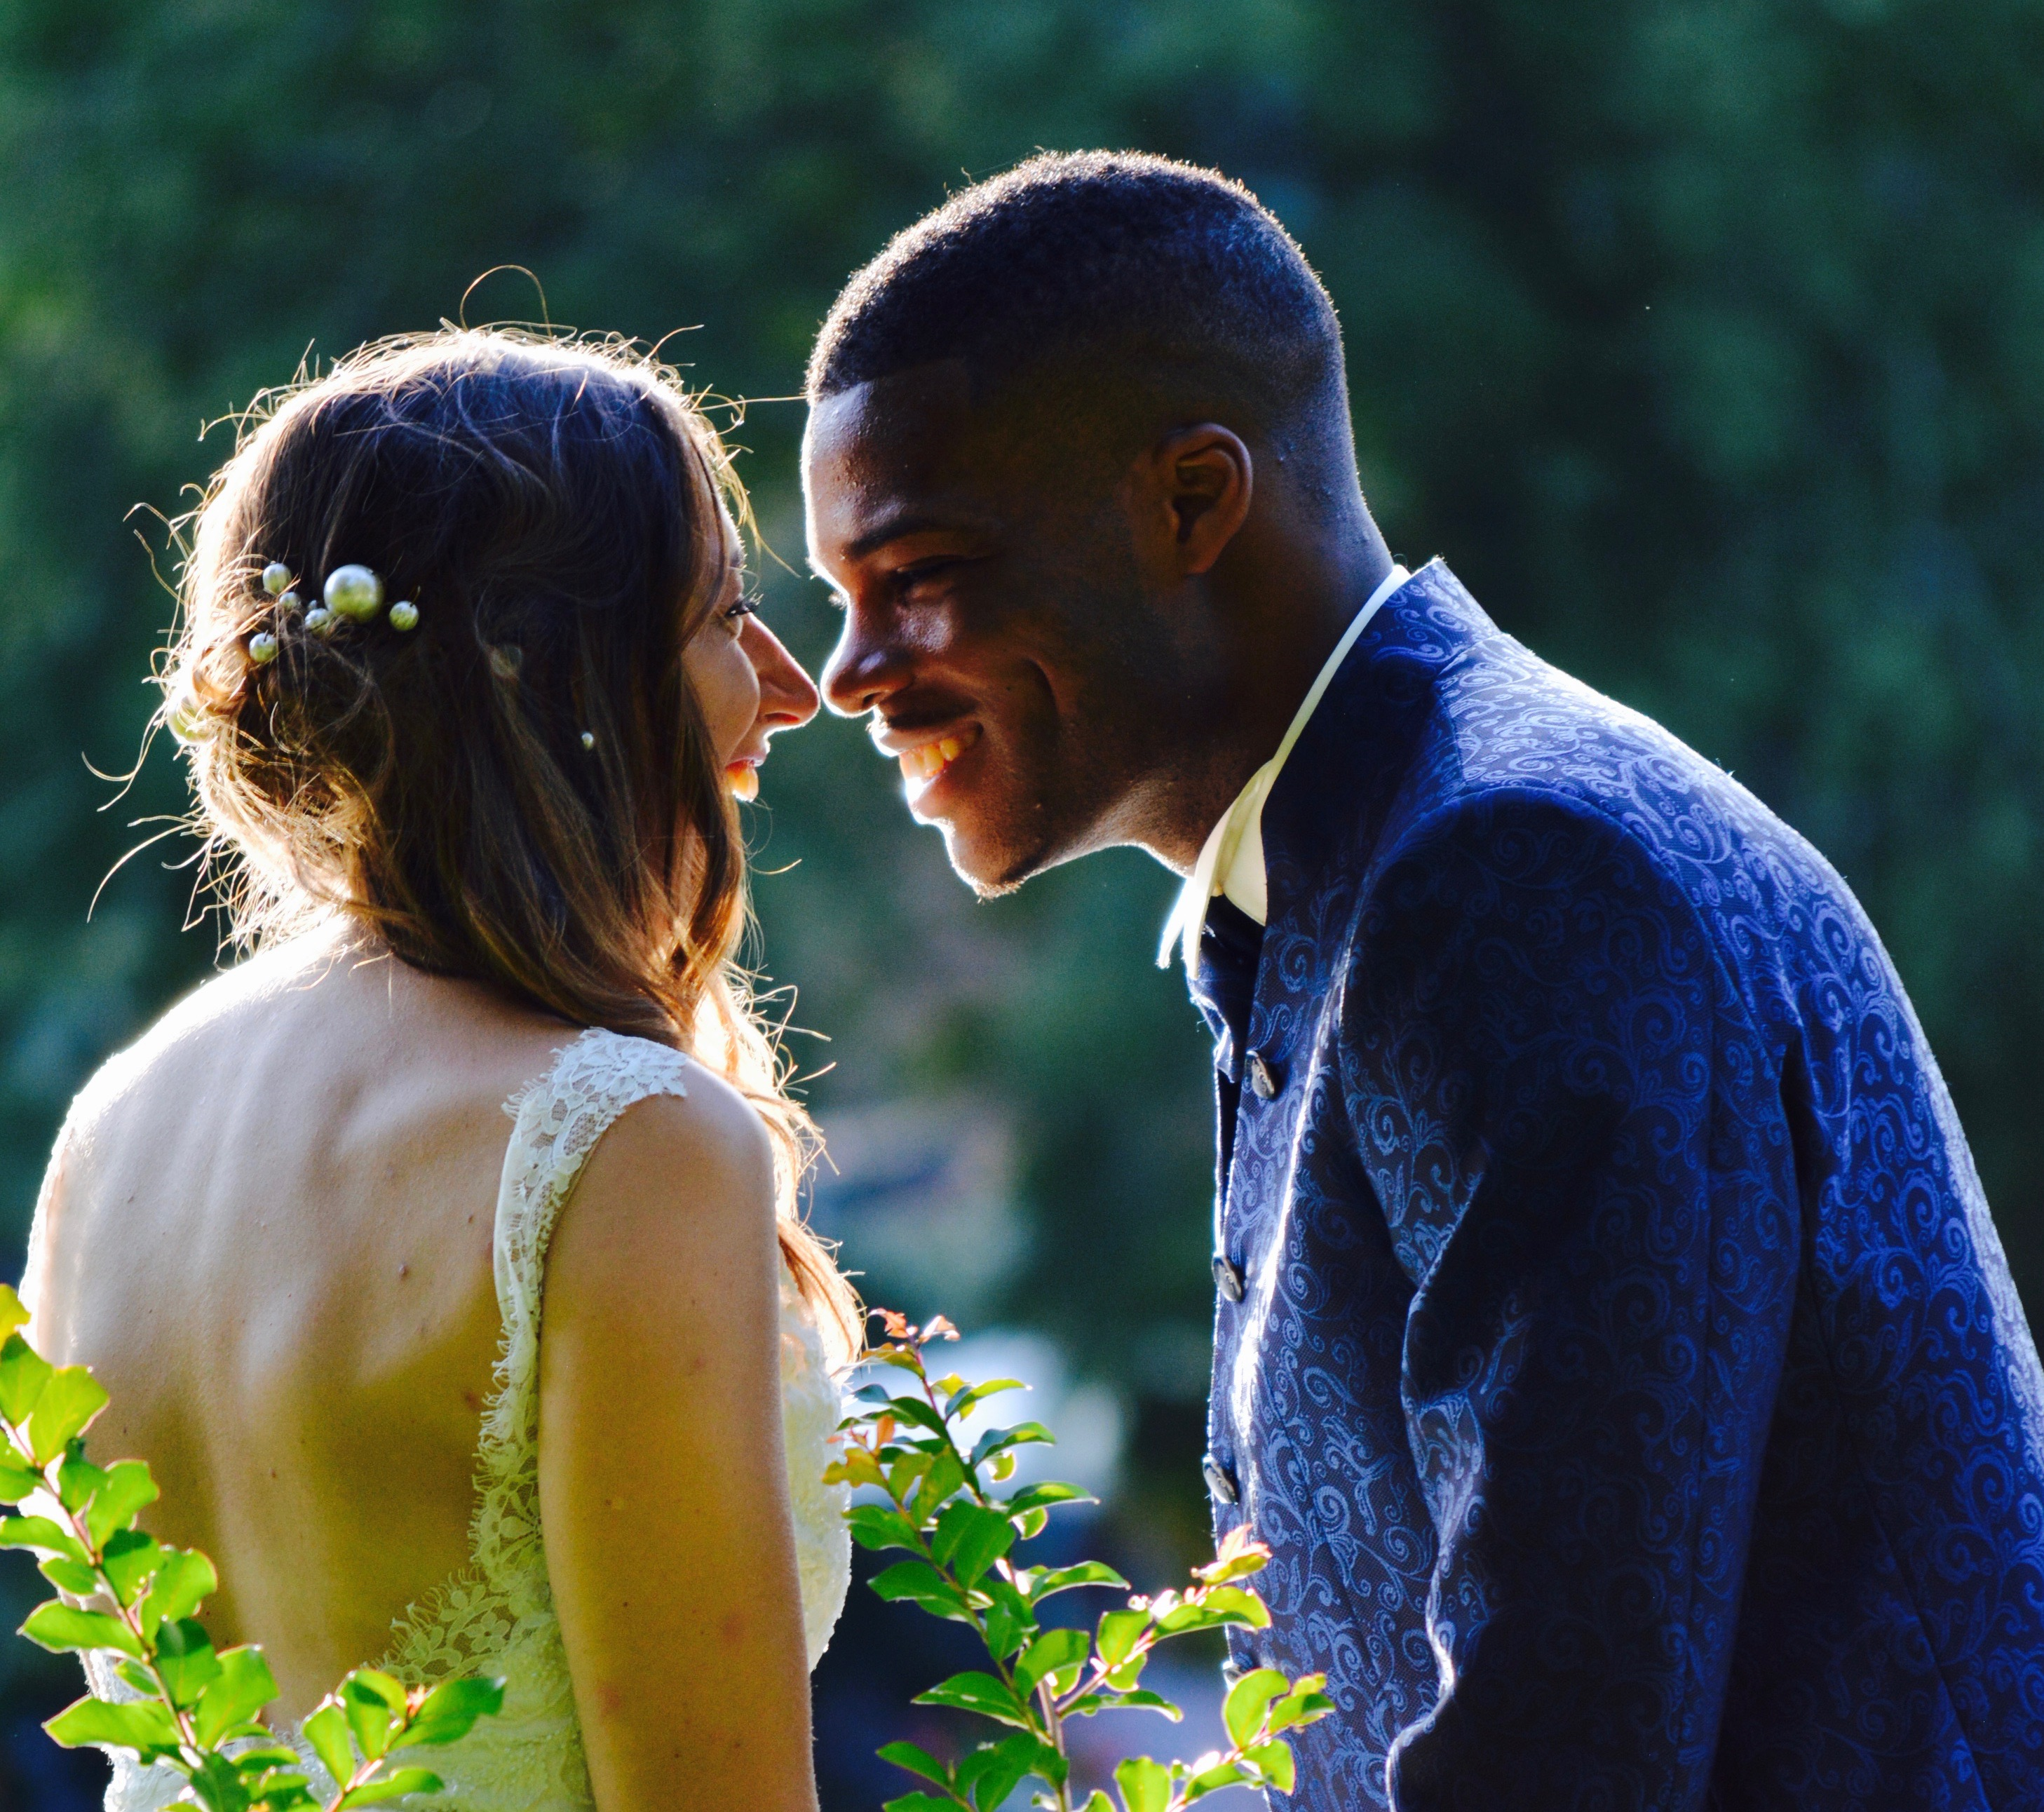 Destination wedding in Lake Garda Italy